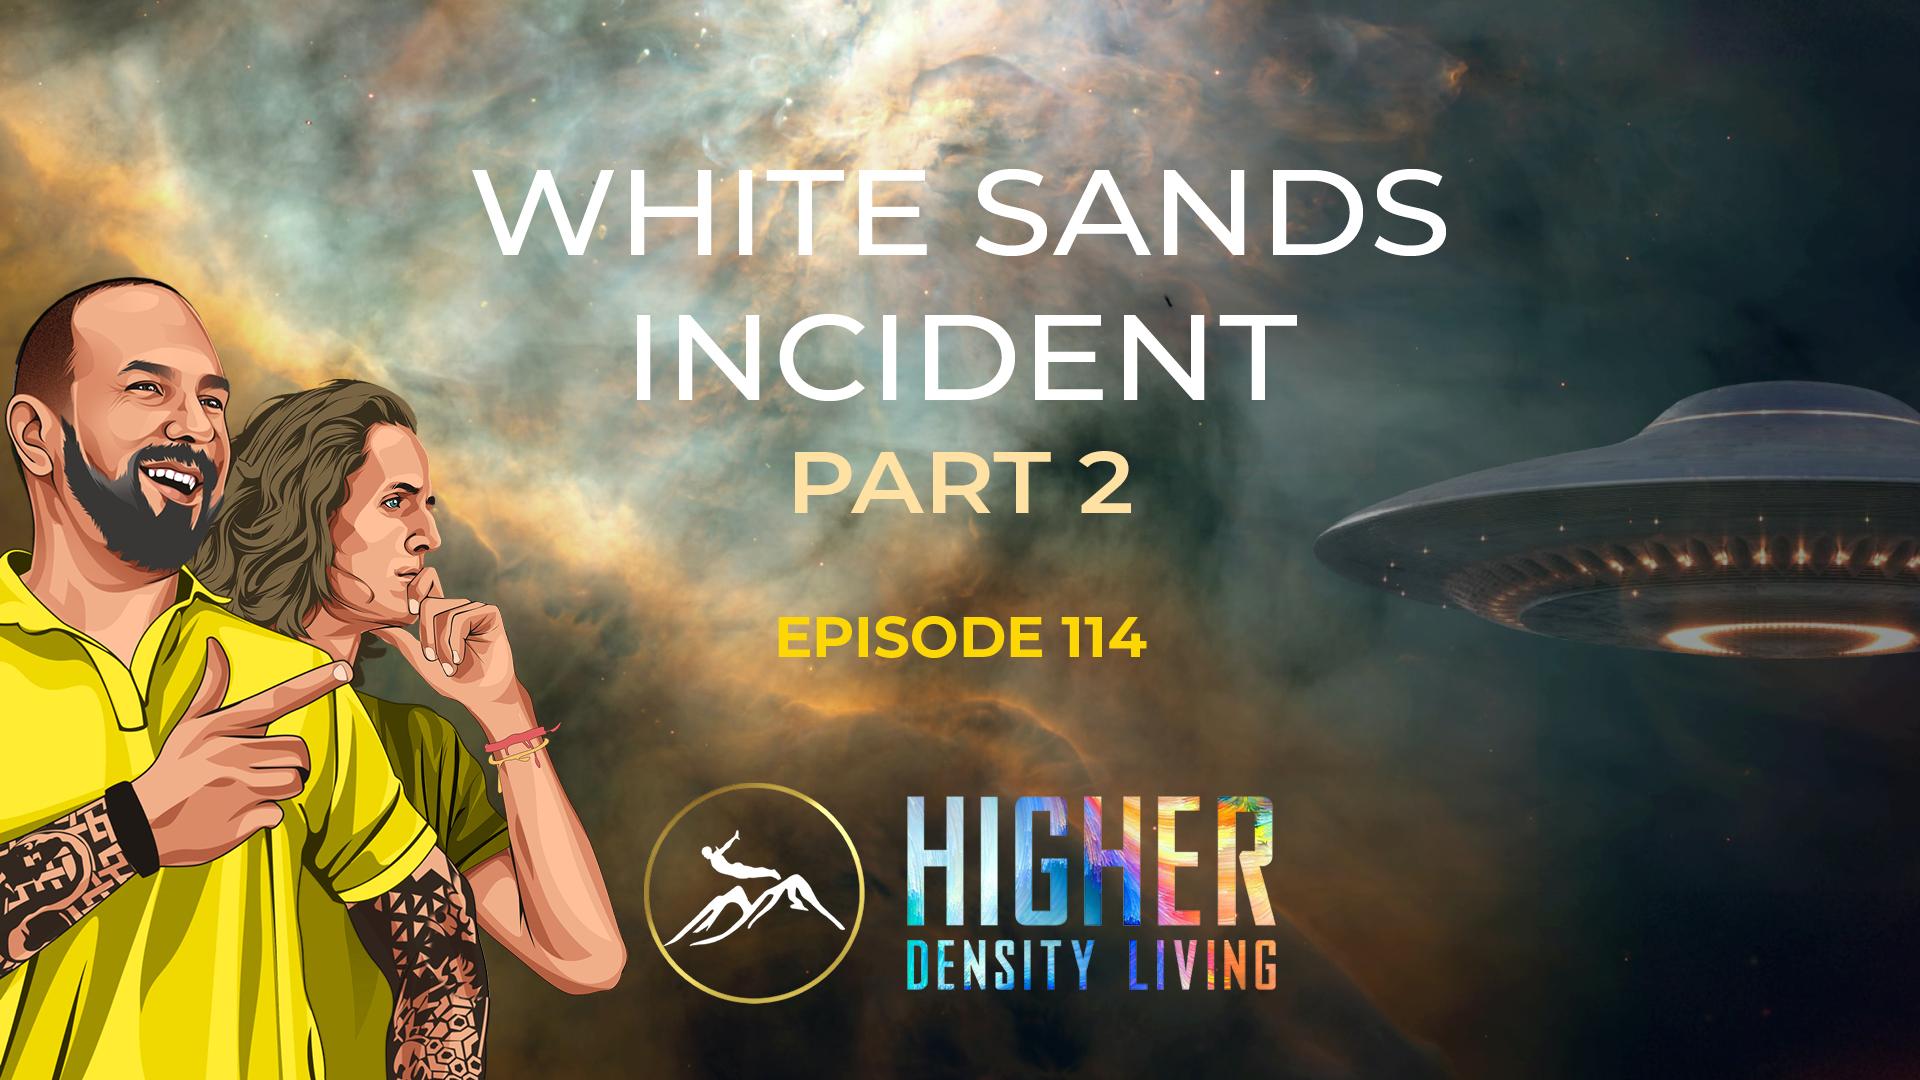 White Sands Incident - Part 2